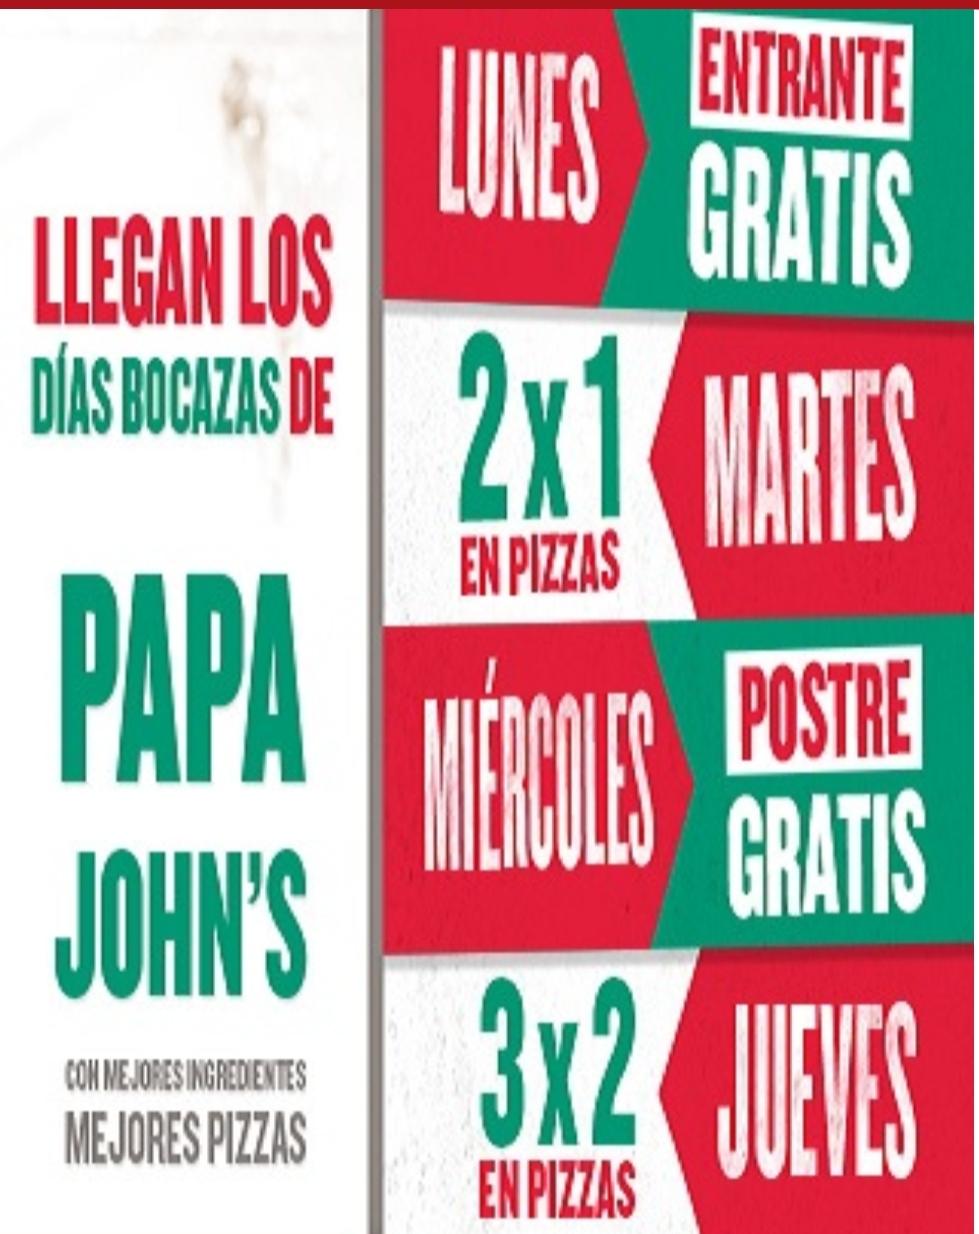 Ofertas Papa Johns septiembre HOY 2x1